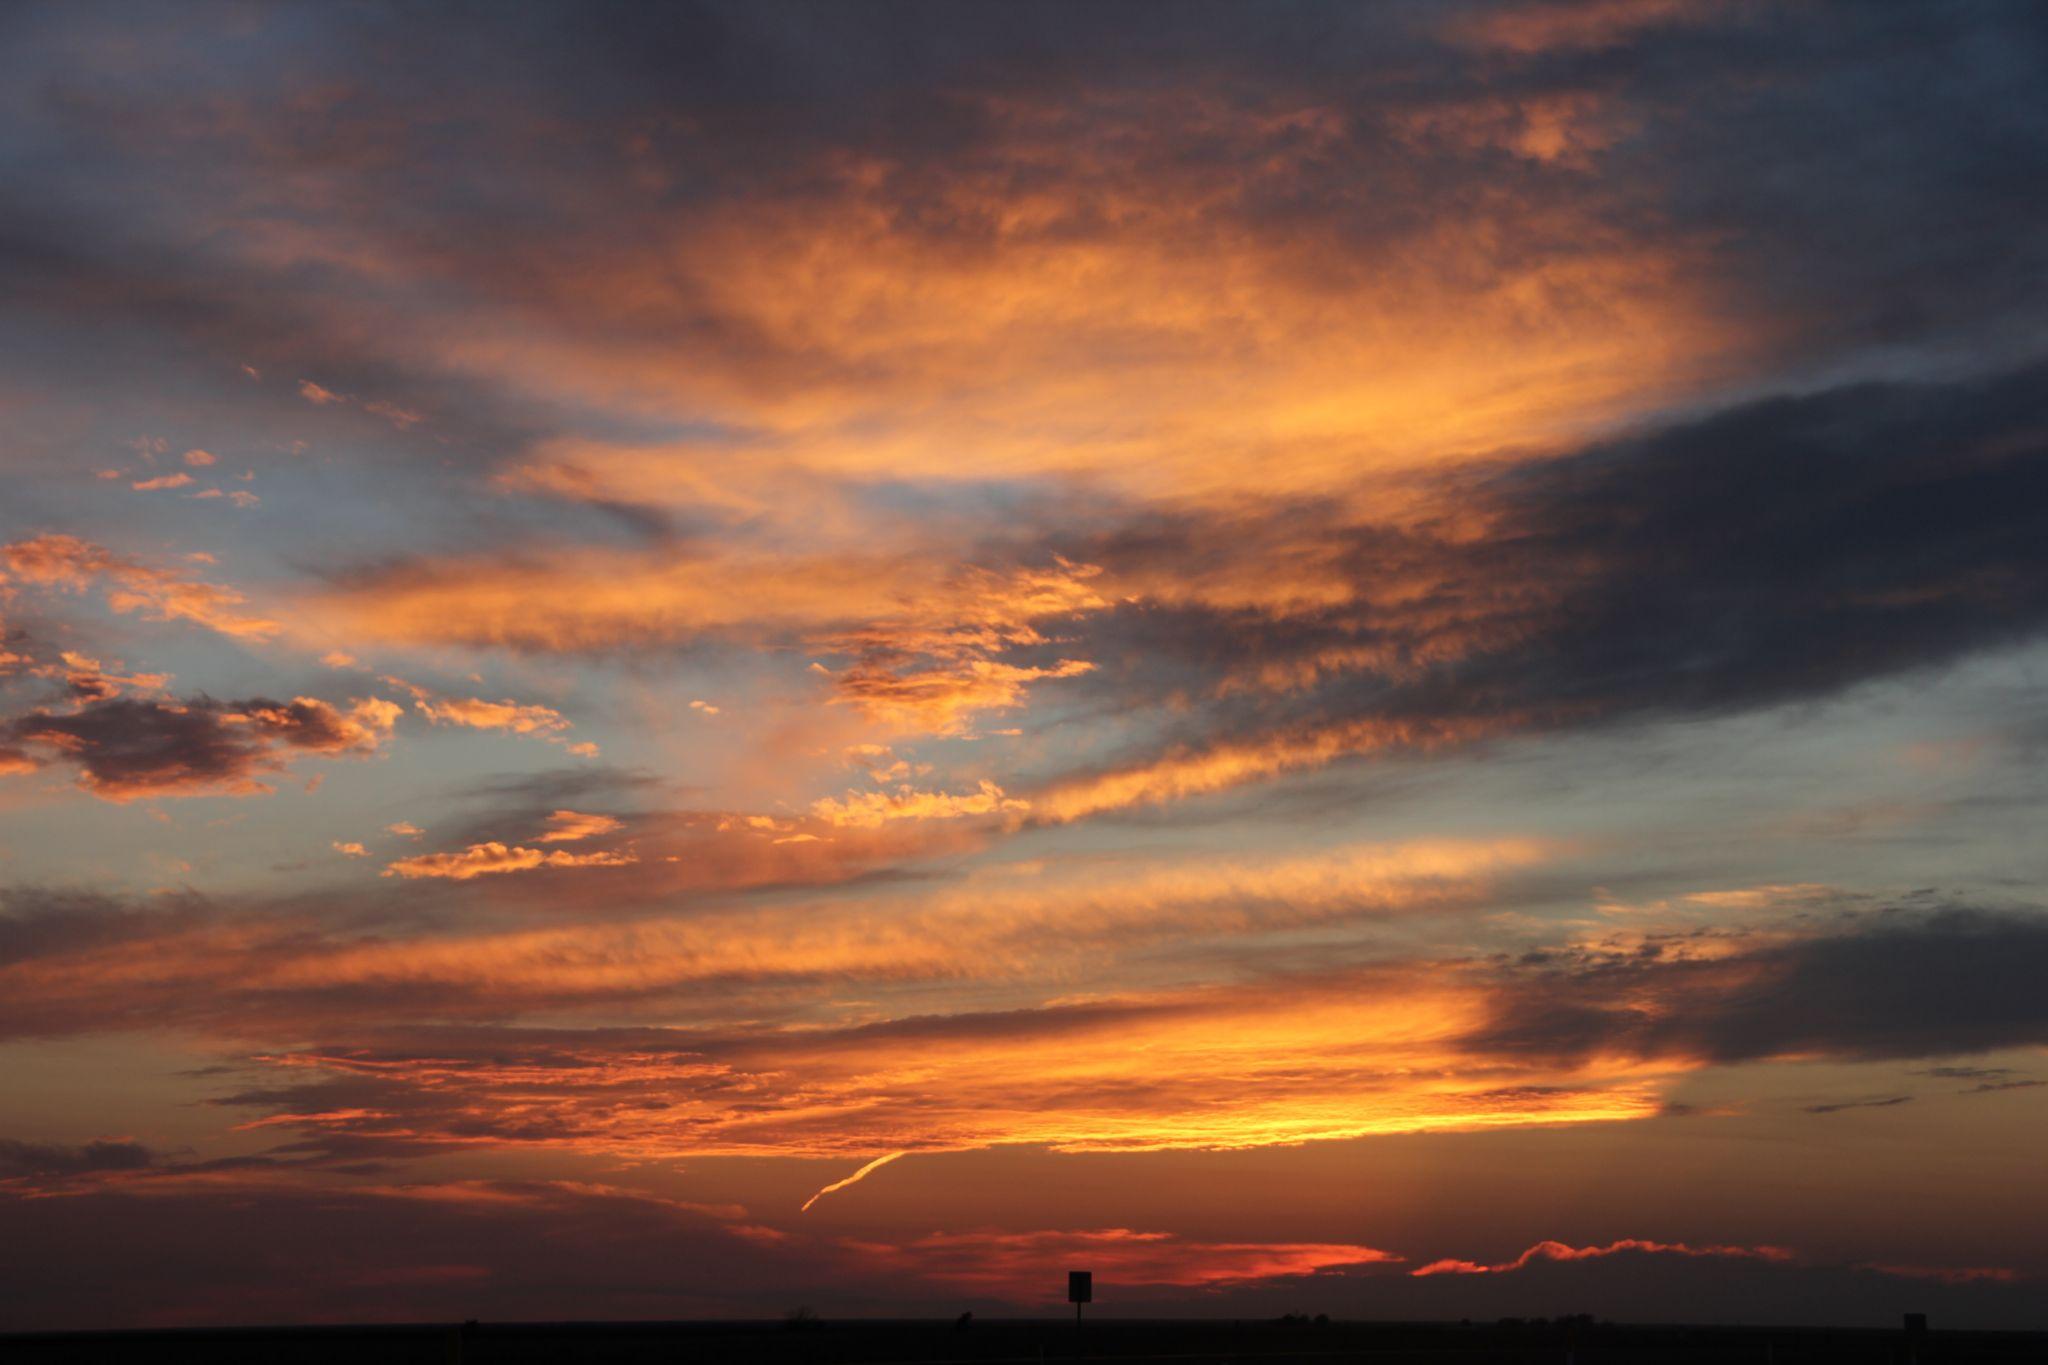 Sunset by Lori Stalcar